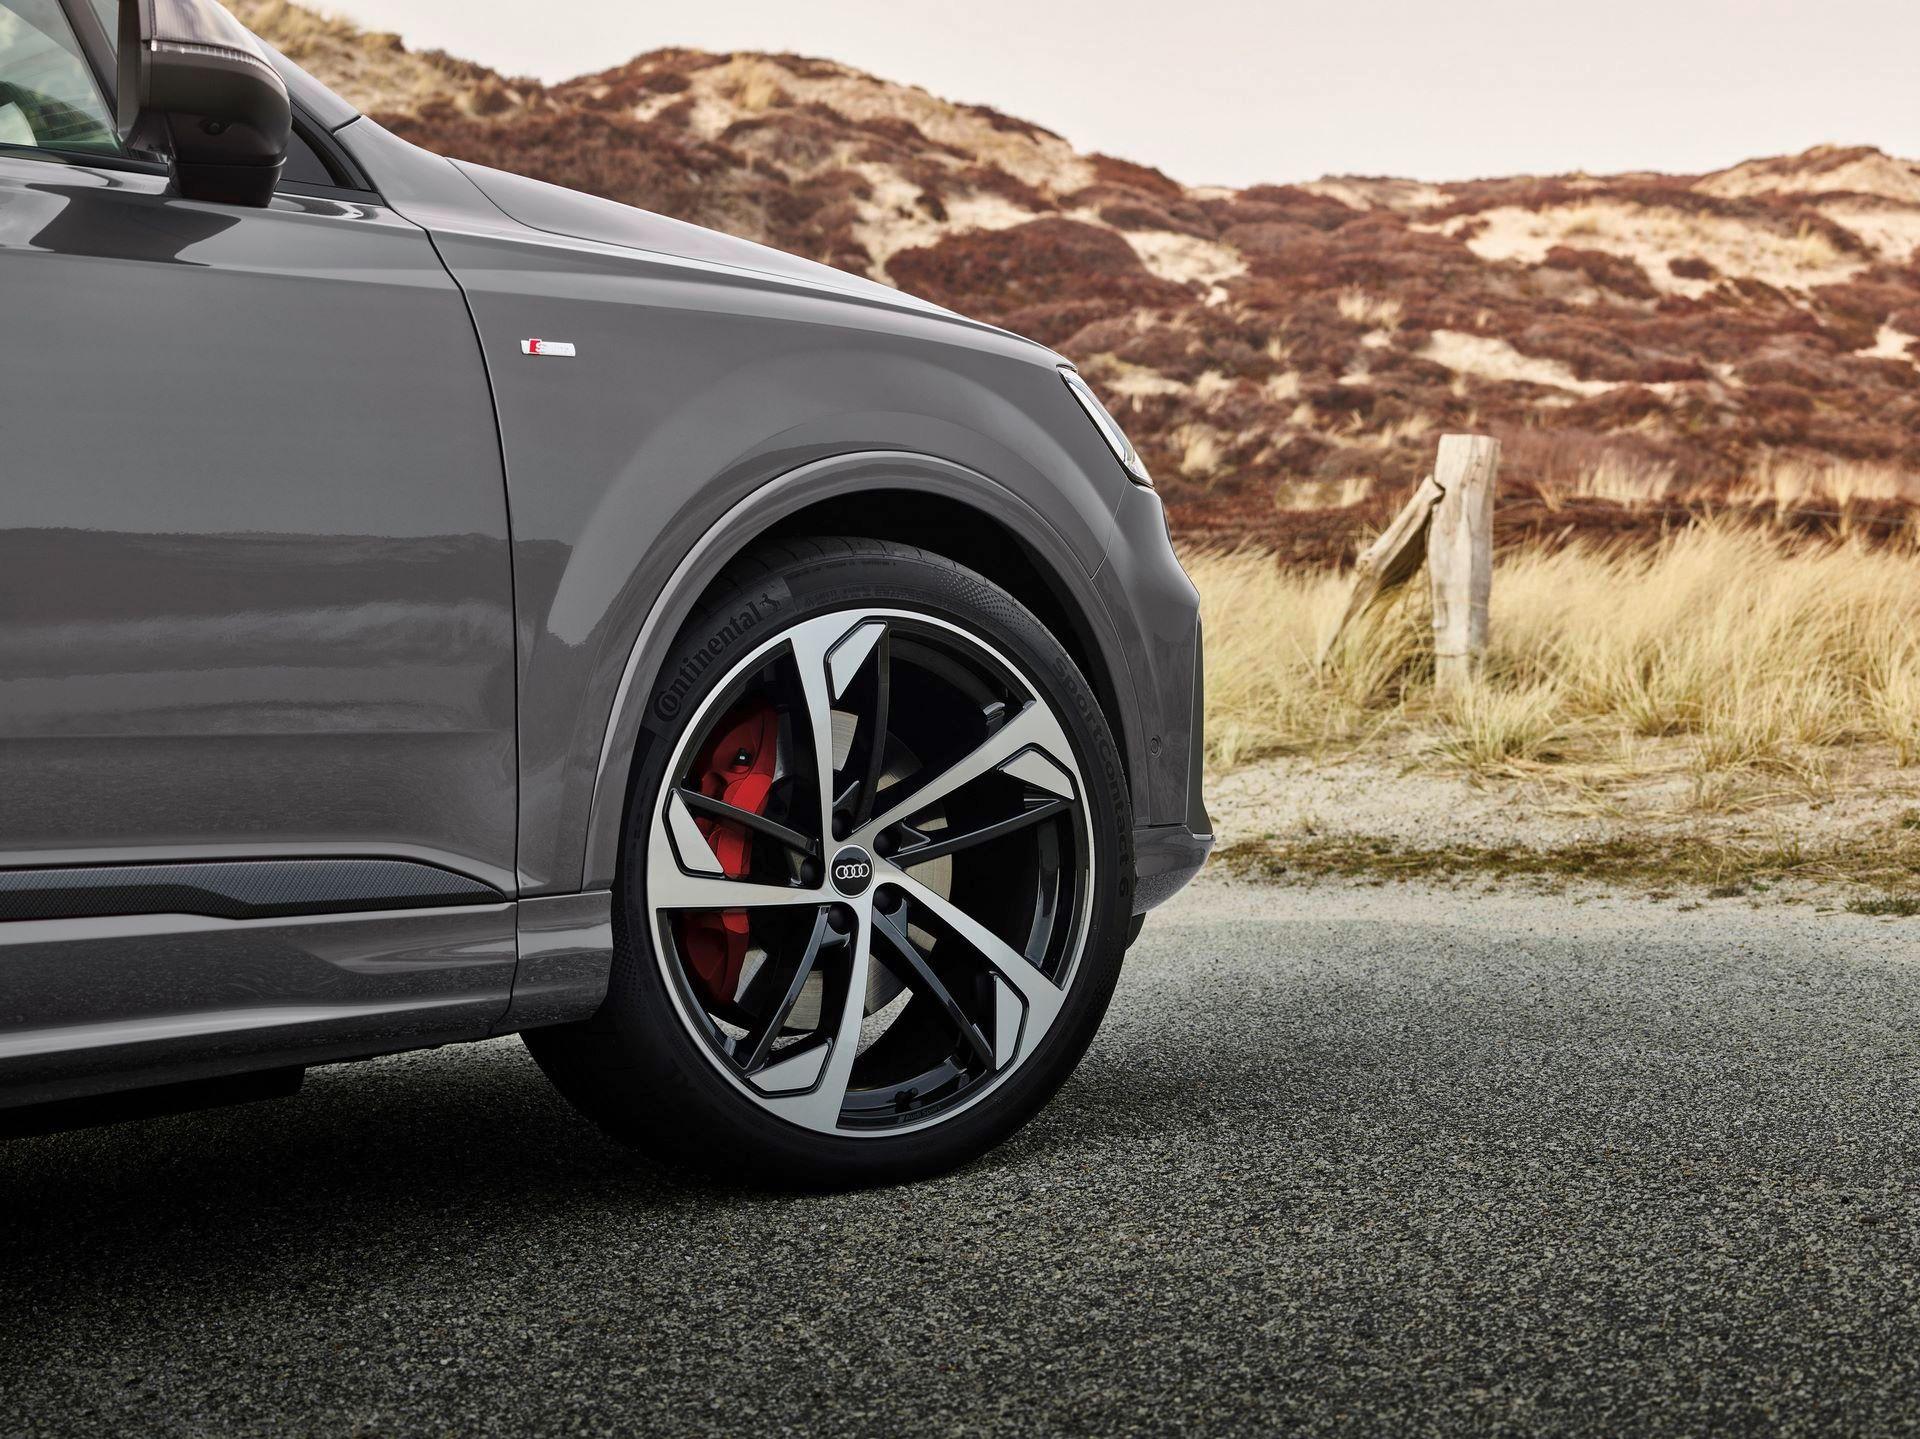 Audi-A4-A5-Q7-Q8-Competition-And-Competition-Plus-Trims-44